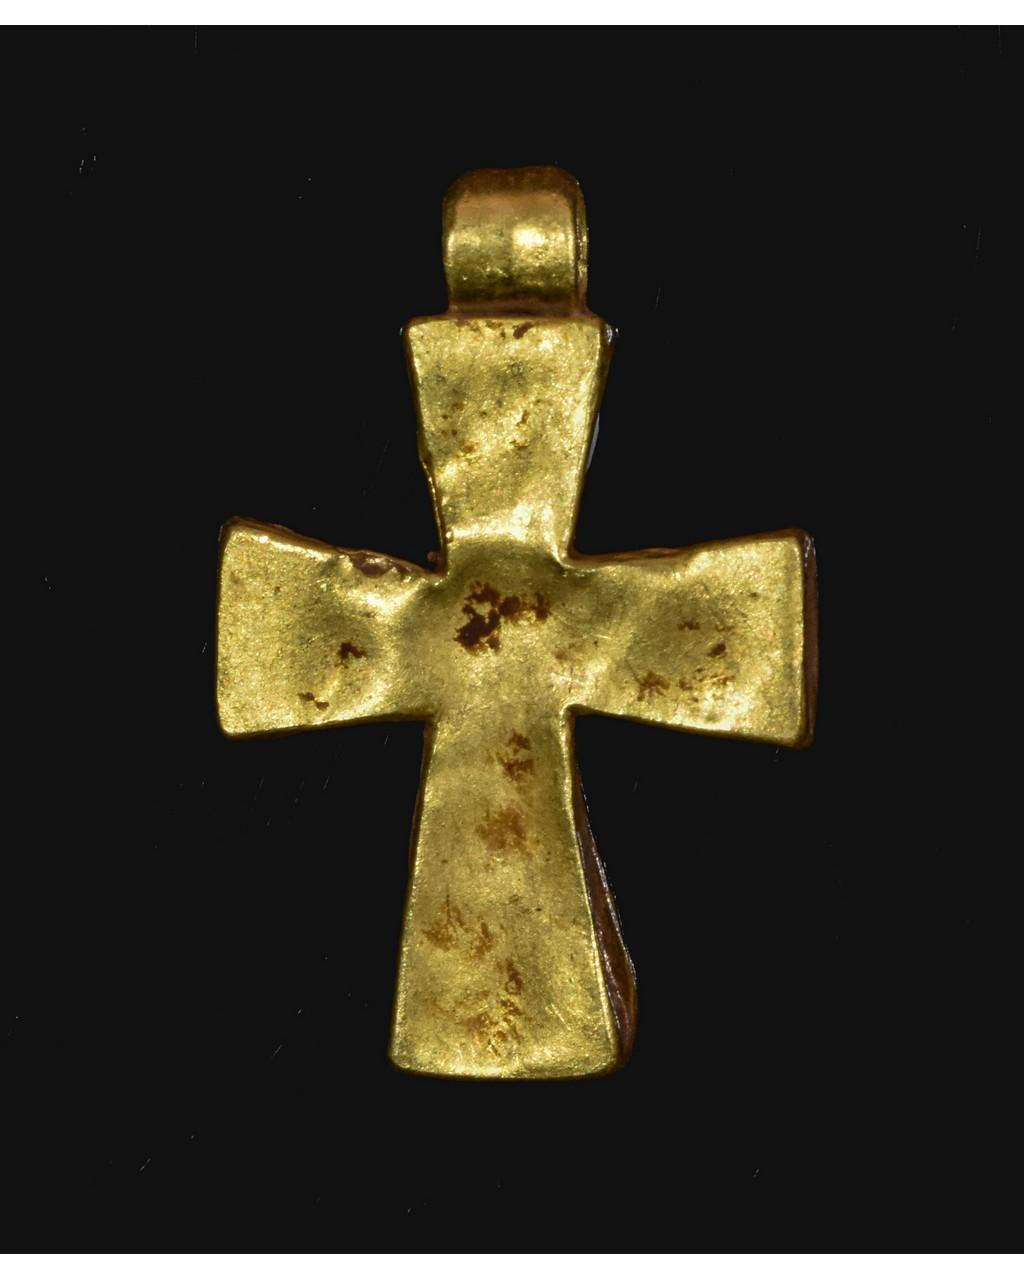 Lot 4 - BYZANTINE GOLD CROSS WITH STONE